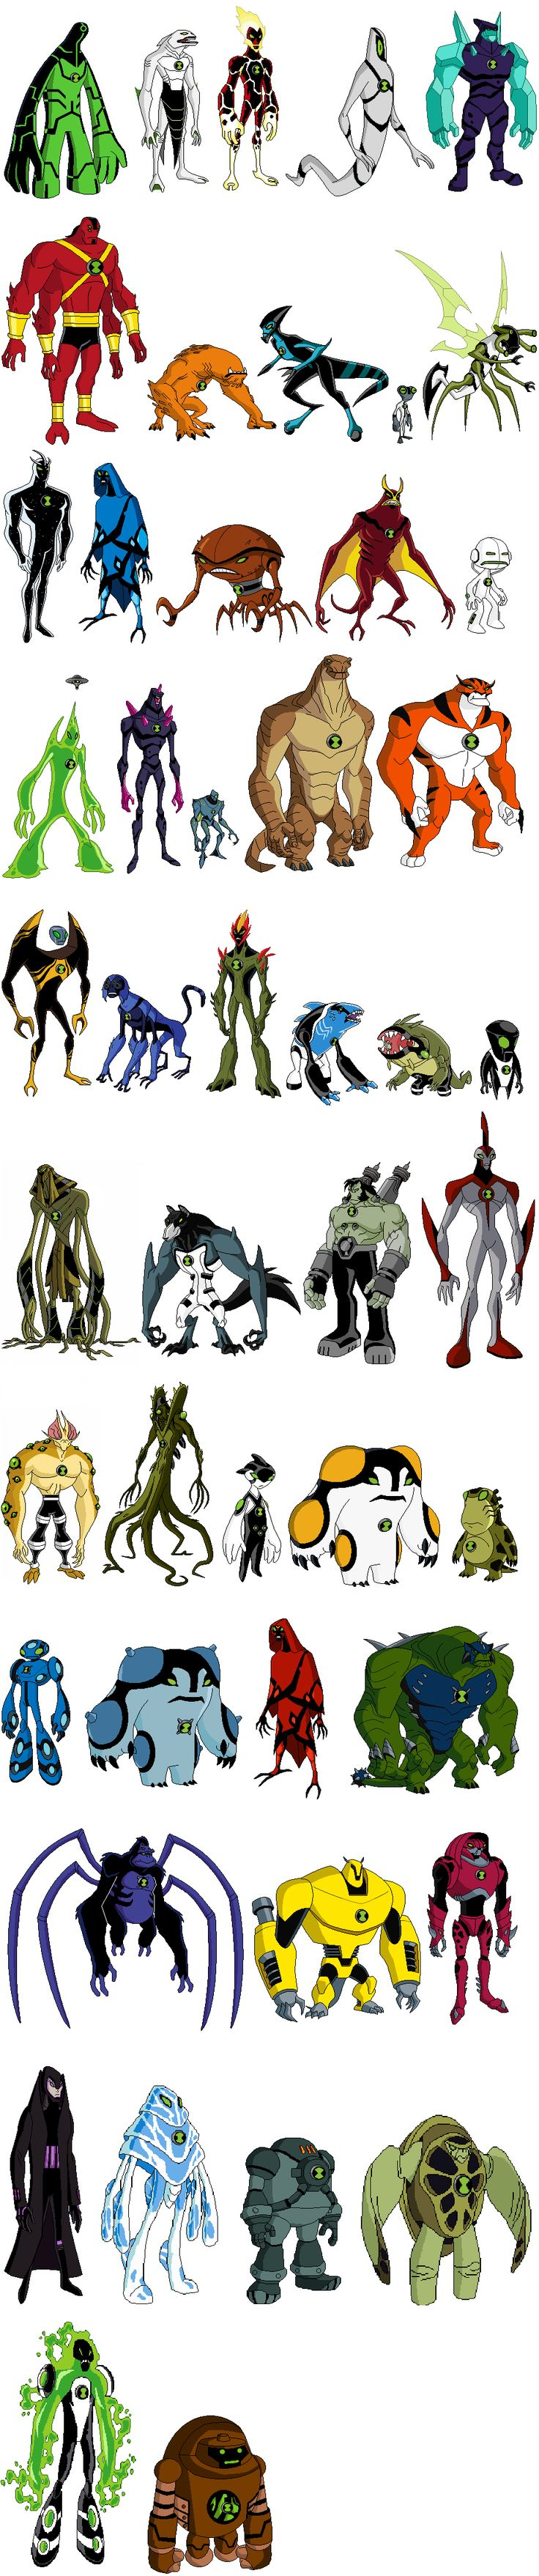 http://images1.wikia.nocookie.net/__cb20110421033906/ben10/es/images/5/52/The_Original_Aliens_From_Ben_10_in_Ultimate_Alien_UA.png